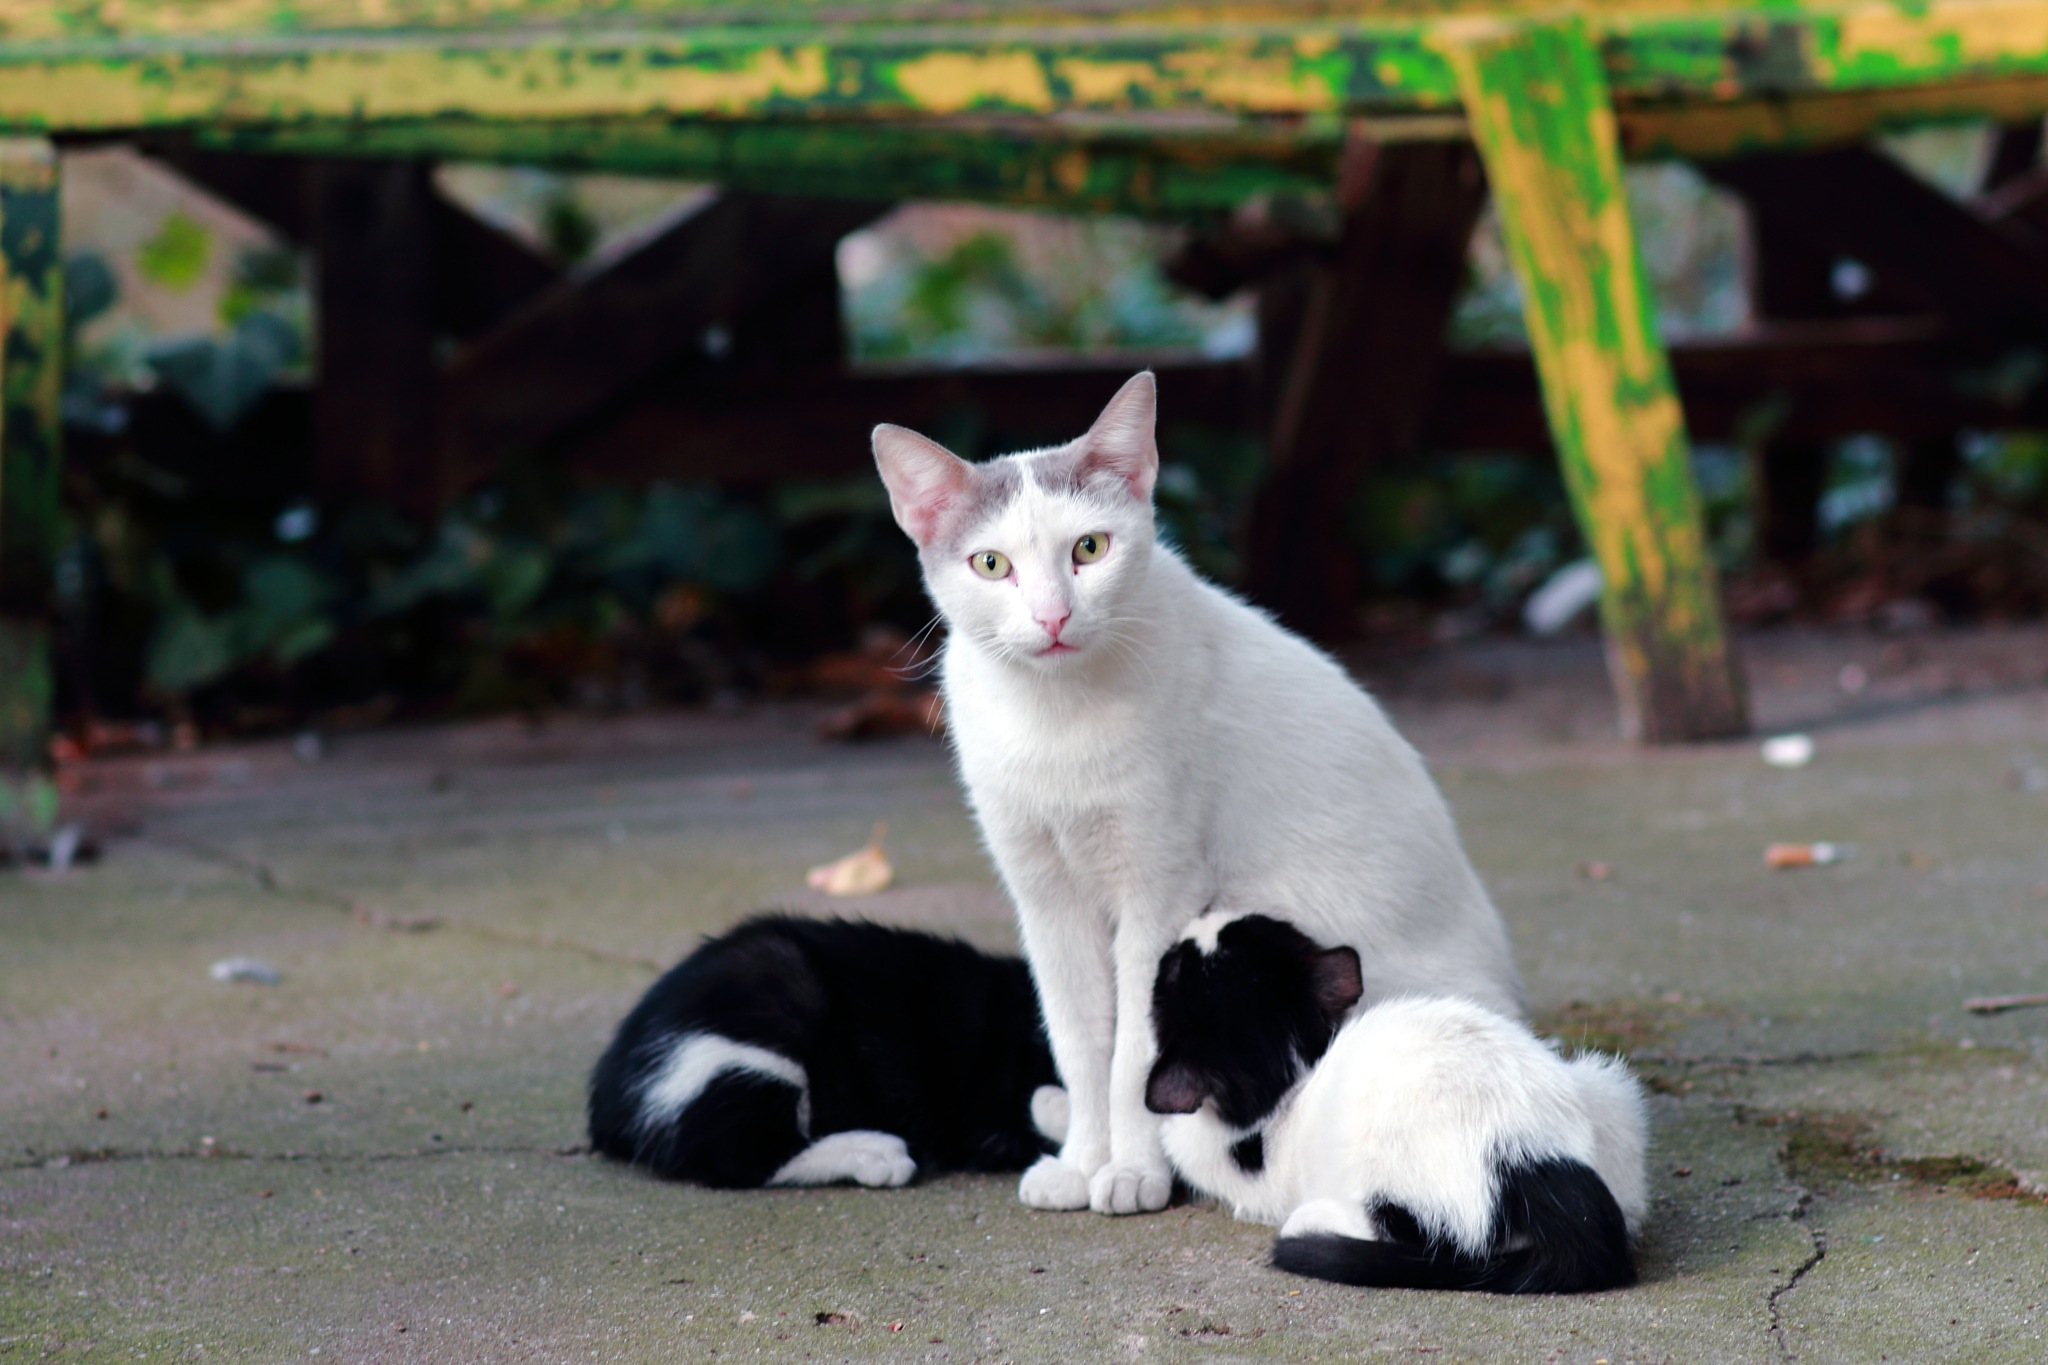 Cats love by Sergey Sokolov